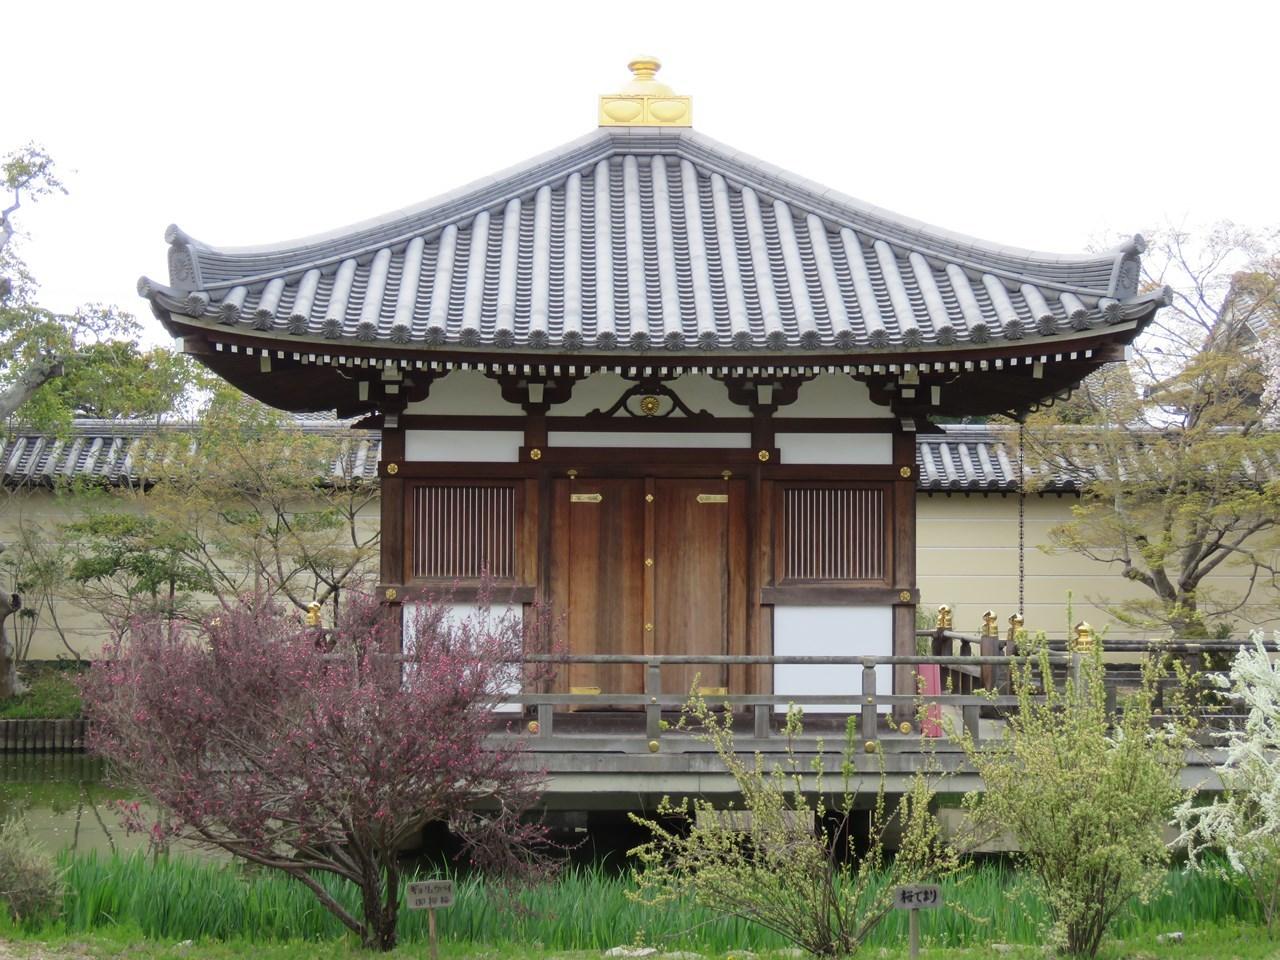 s-海龍王寺 護摩堂